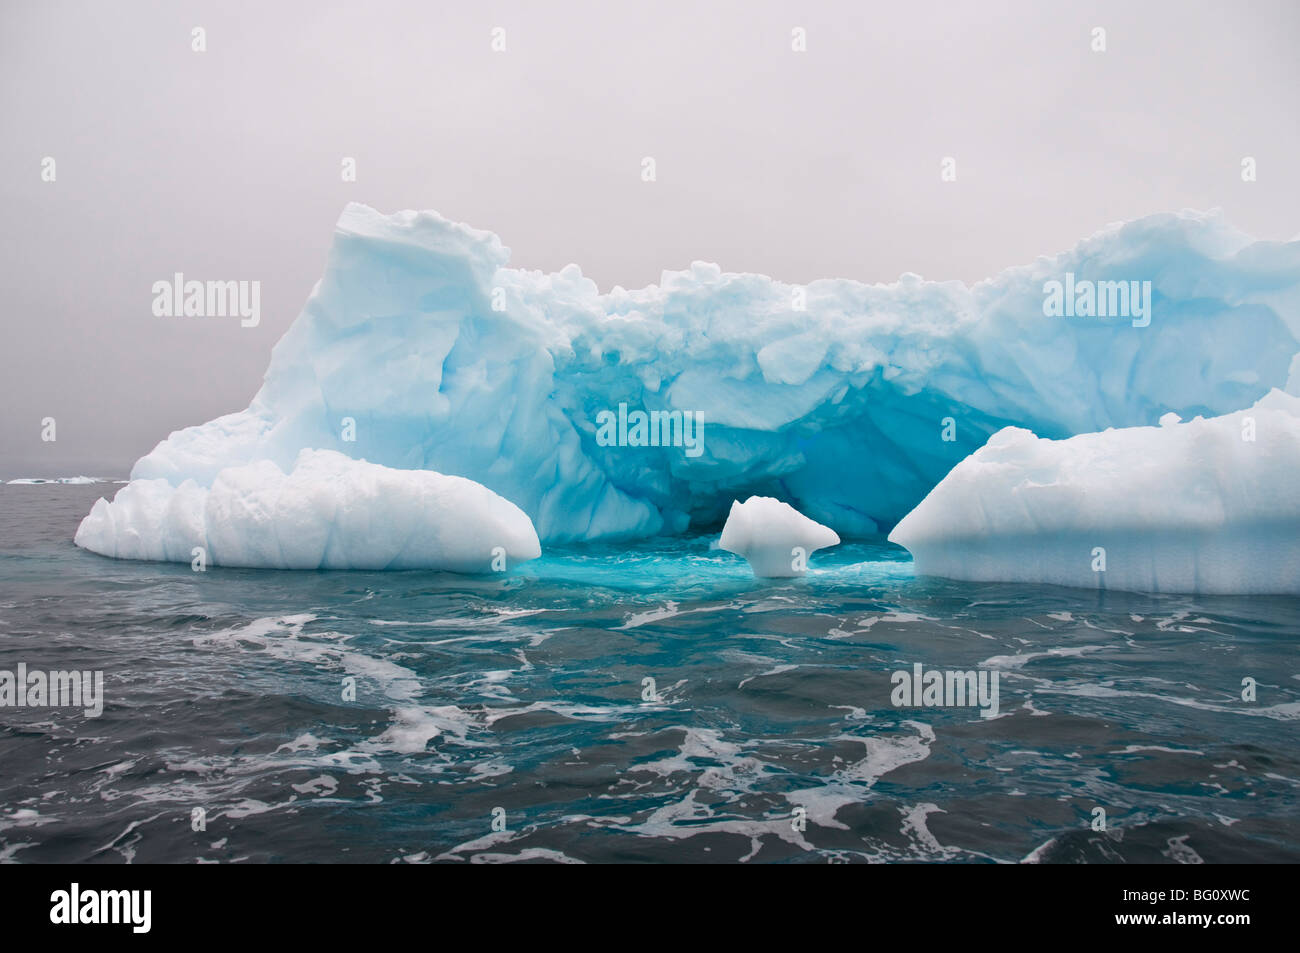 Iceberg, vicino Isola Yalour, Penisola Antartica, Antartide, regioni polari Immagini Stock